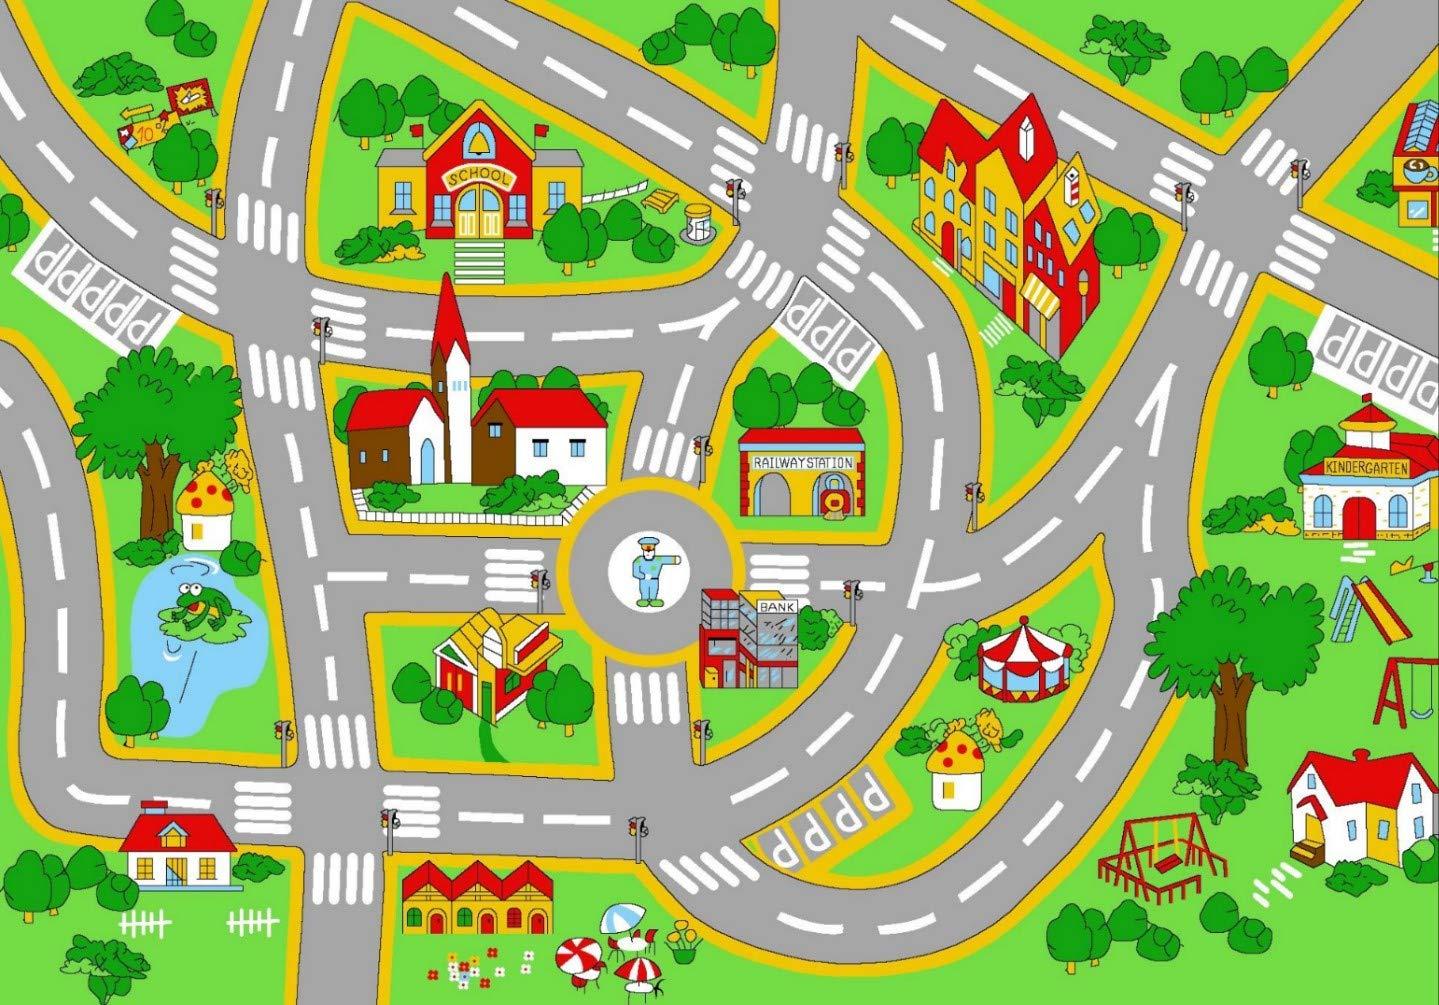 HUAHOO Kids' Rug With Roads Kids Rug play mat City Street Map Children Learning Carpet Play Carpet Kids Rugs Boy Girl Nursery Bedroom Playroom Classrooms Play Mat Children's Area Rug (39.4'' x 59'')